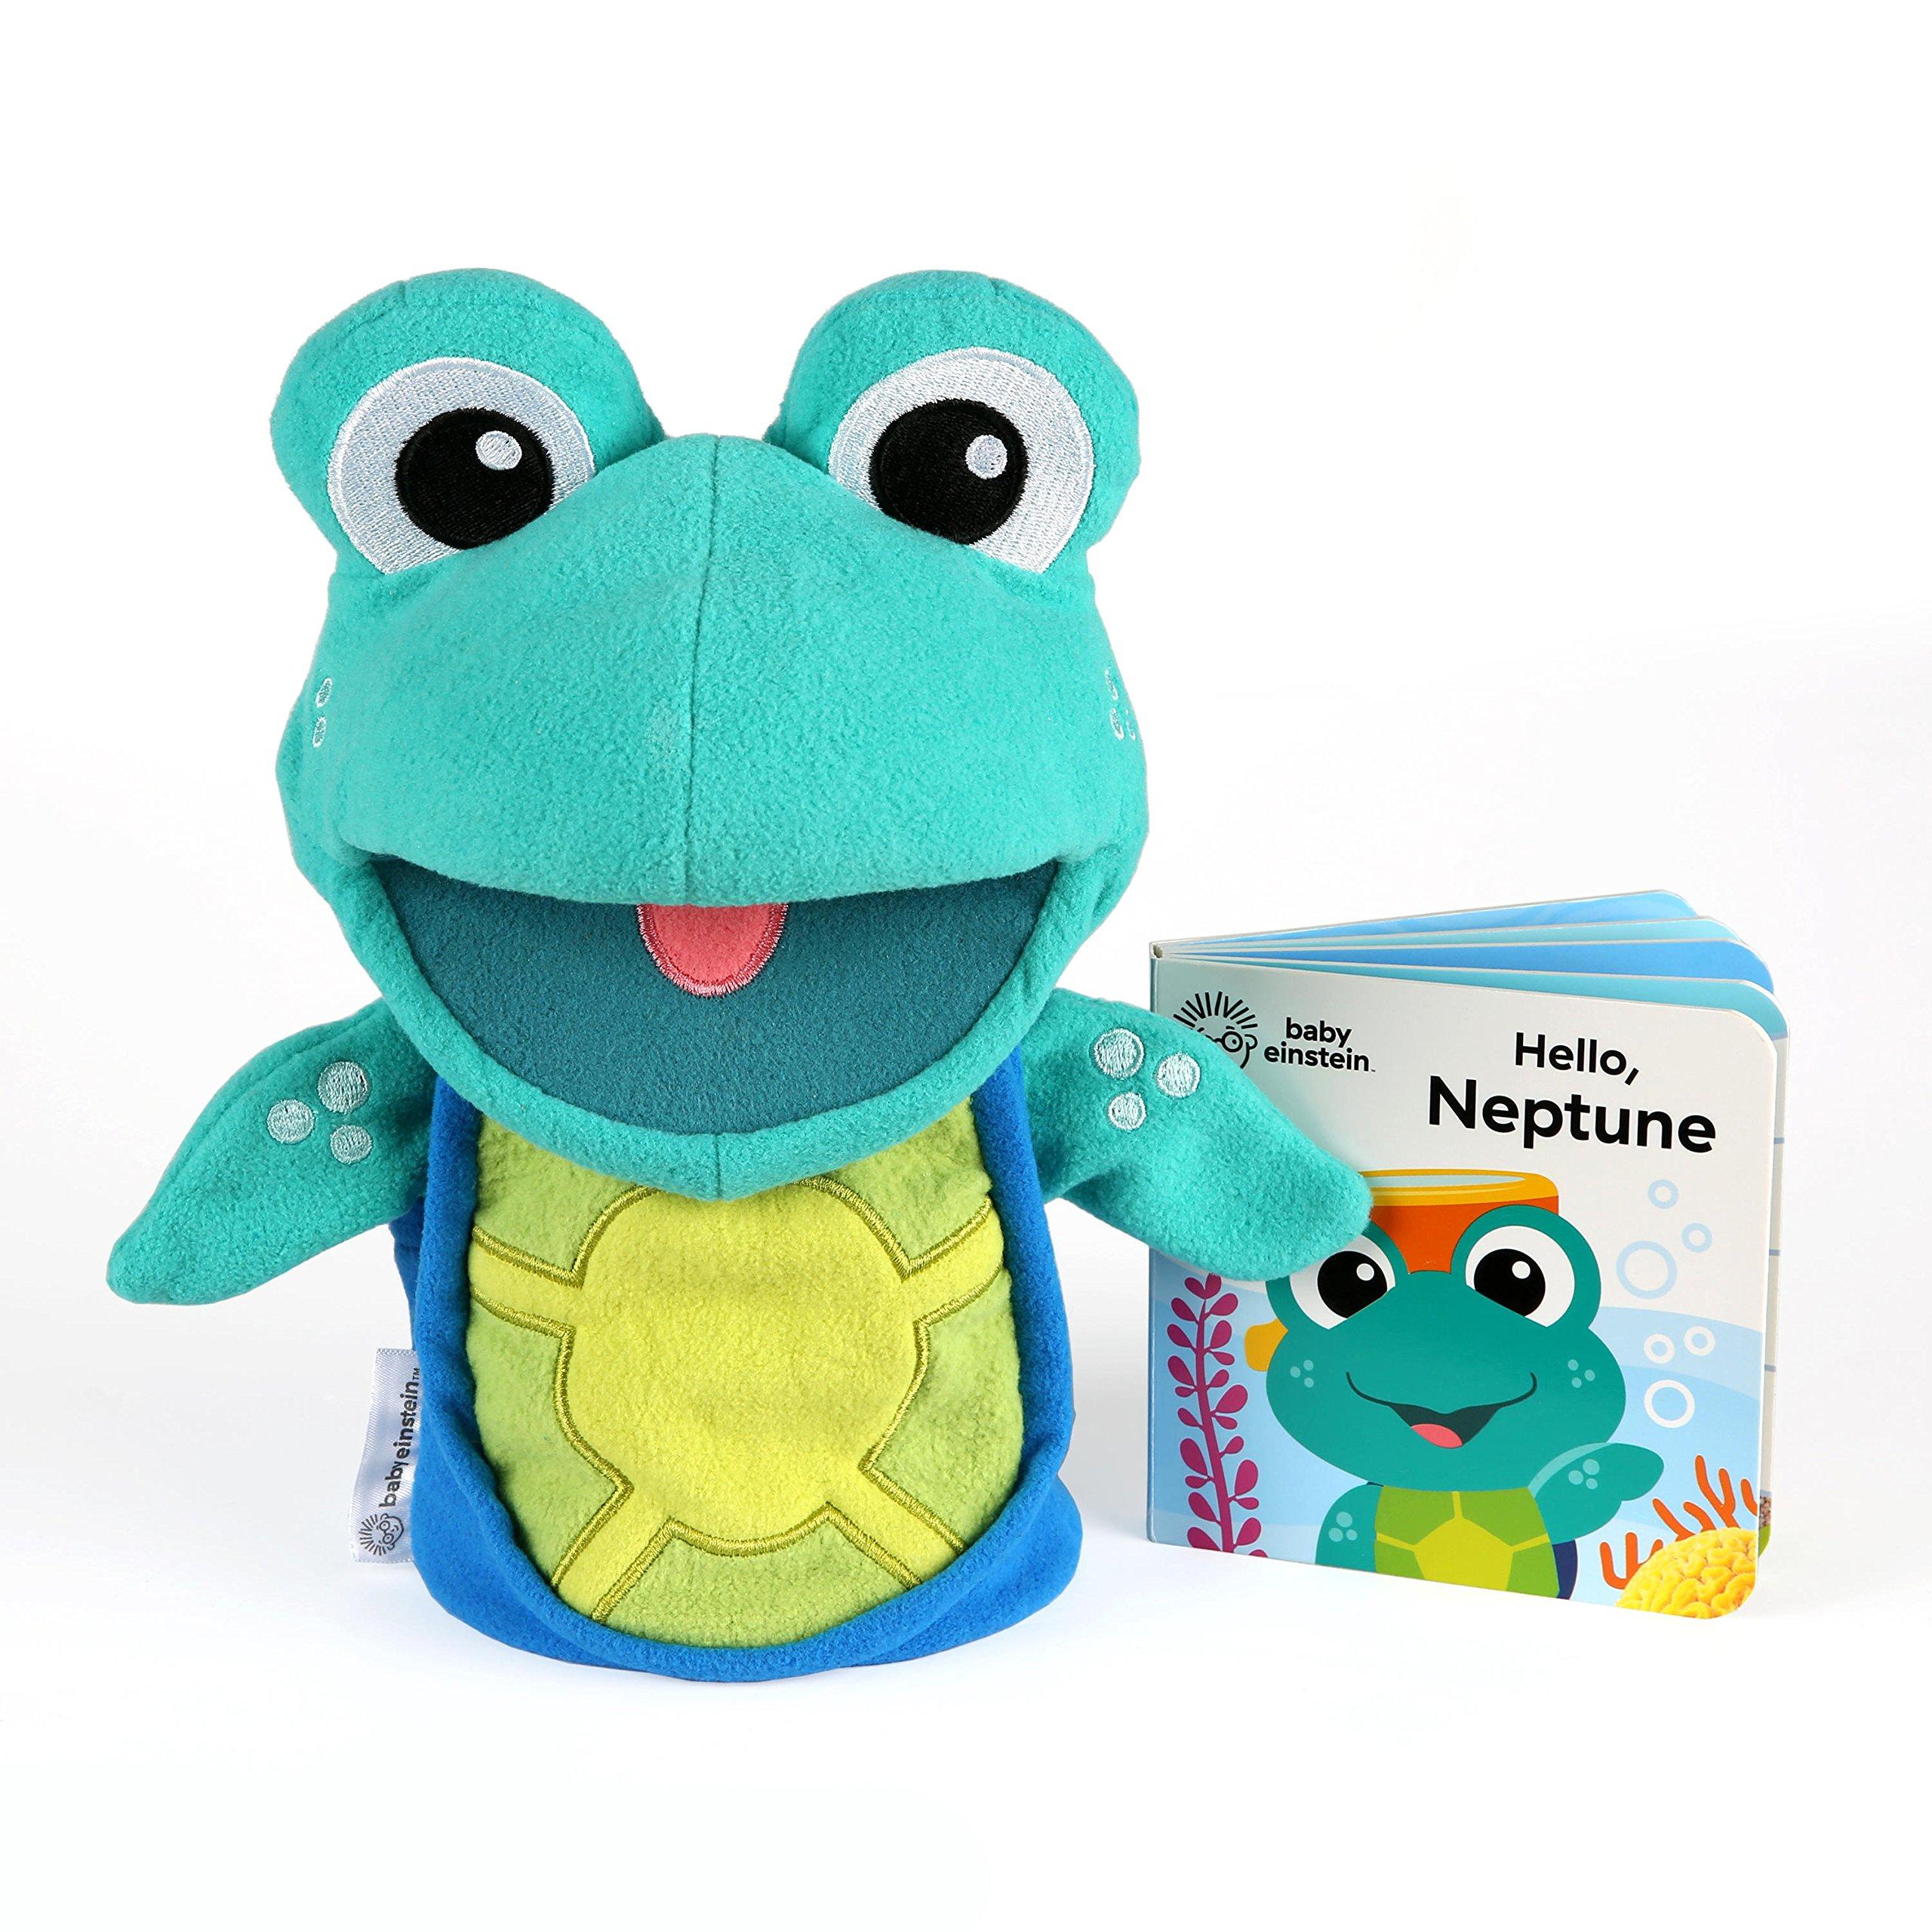 25b6b86c8511 Amazon.com   Baby Einstein Storytime with Neptune Plush Puppet Toy ...